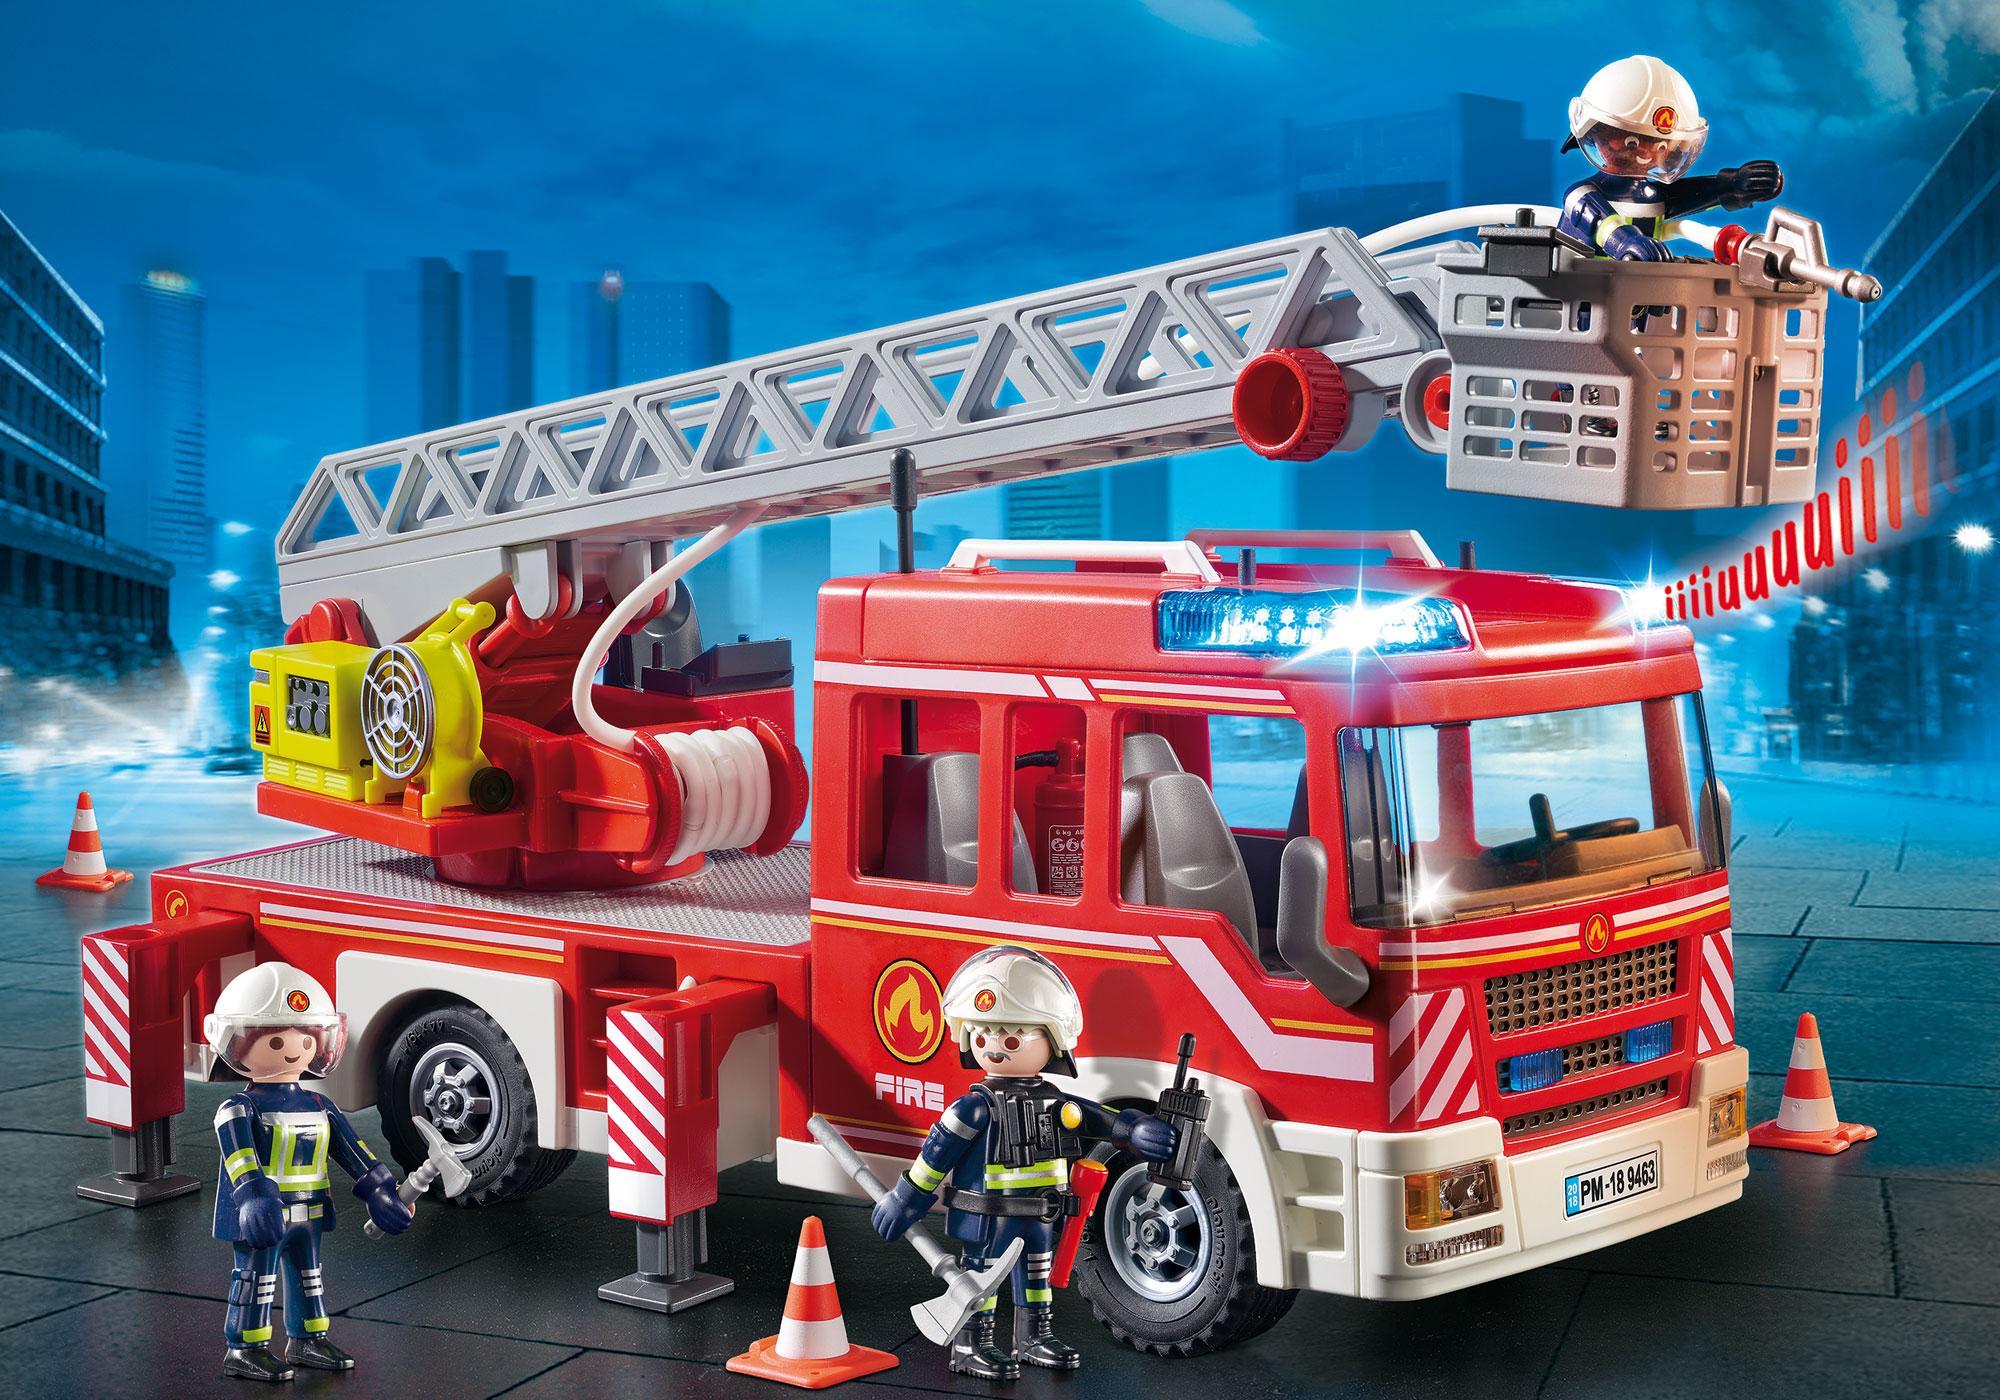 9463_product_detail/Όχημα Πυροσβεστικής με σκάλα και καλάθι διάσωσης